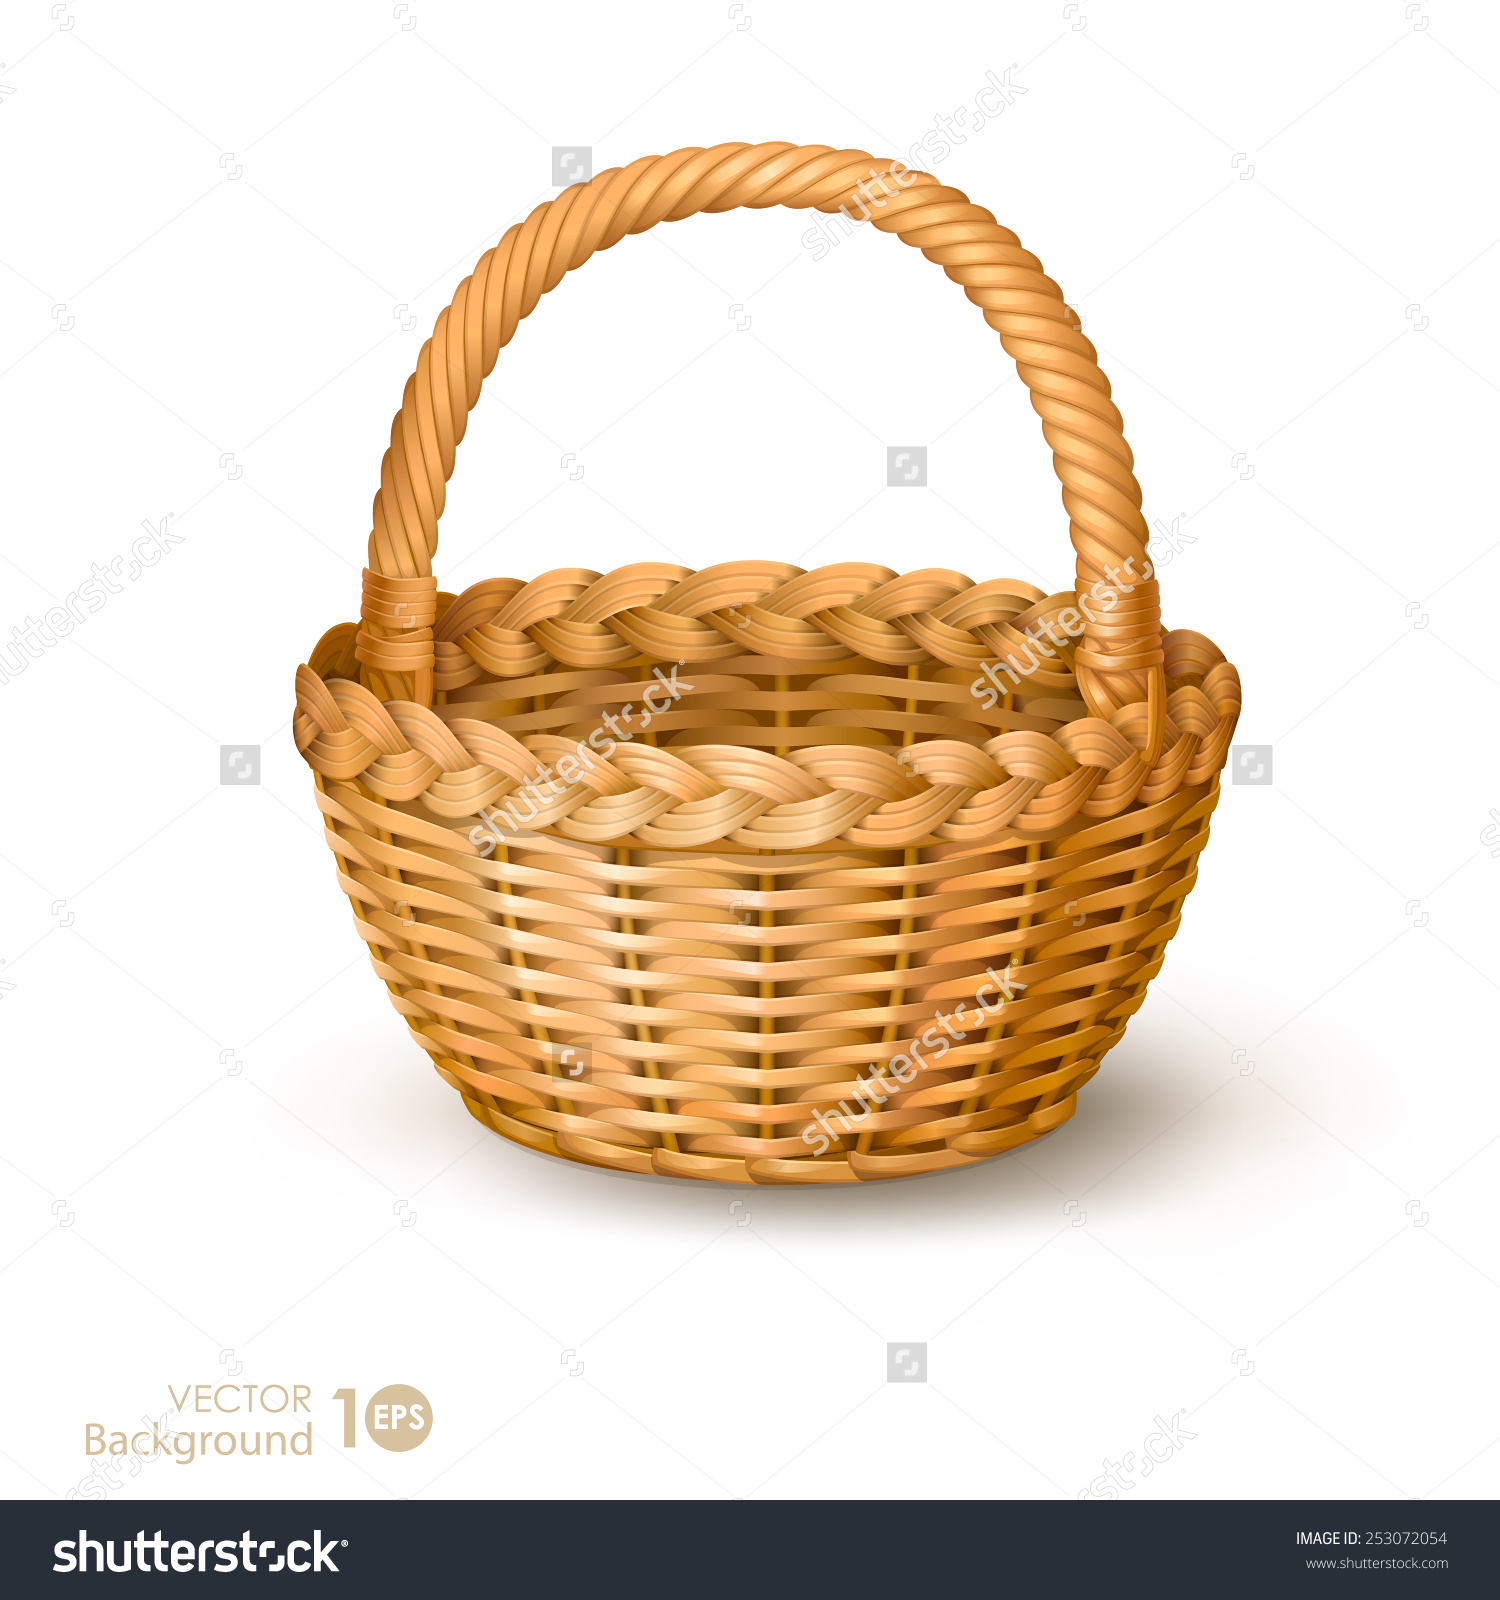 Basket rattan basket